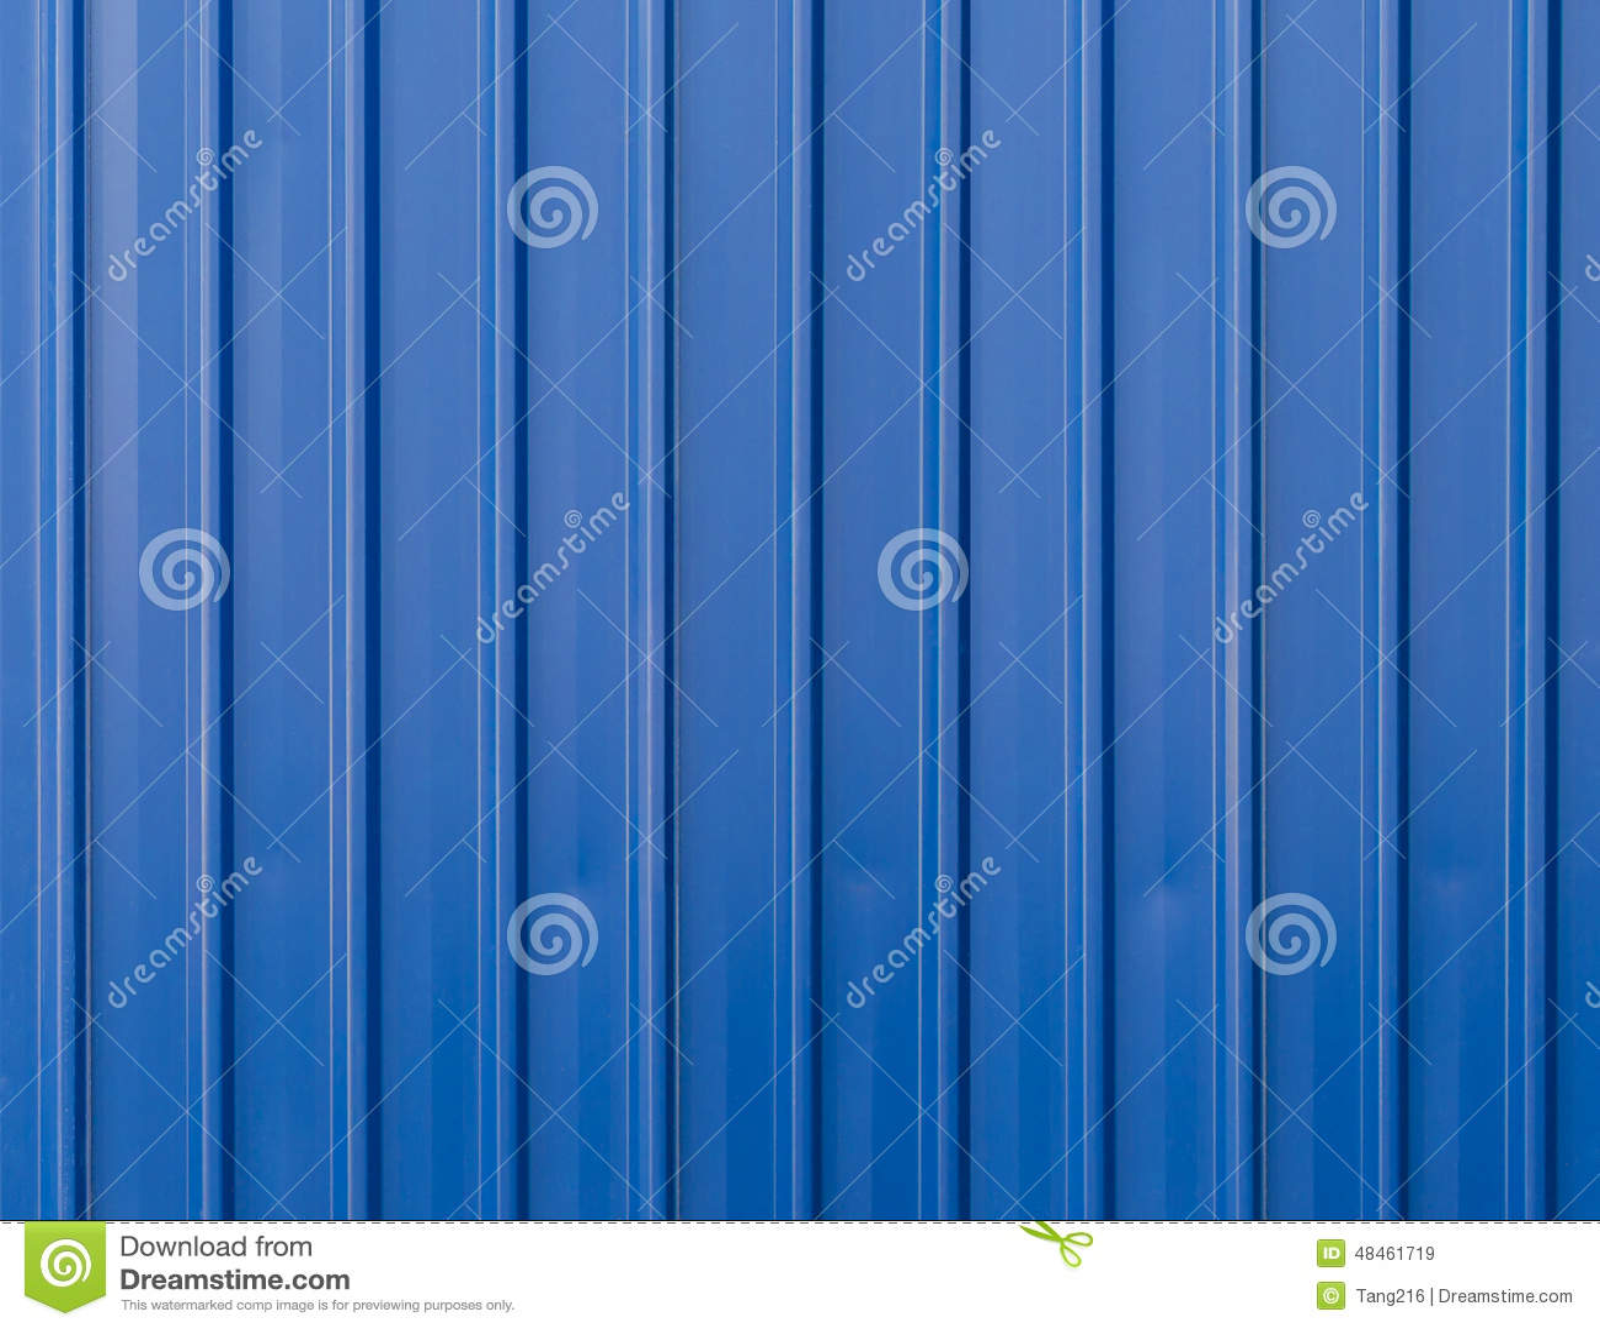 Blue Metal Fence Background Stock Image Image Of